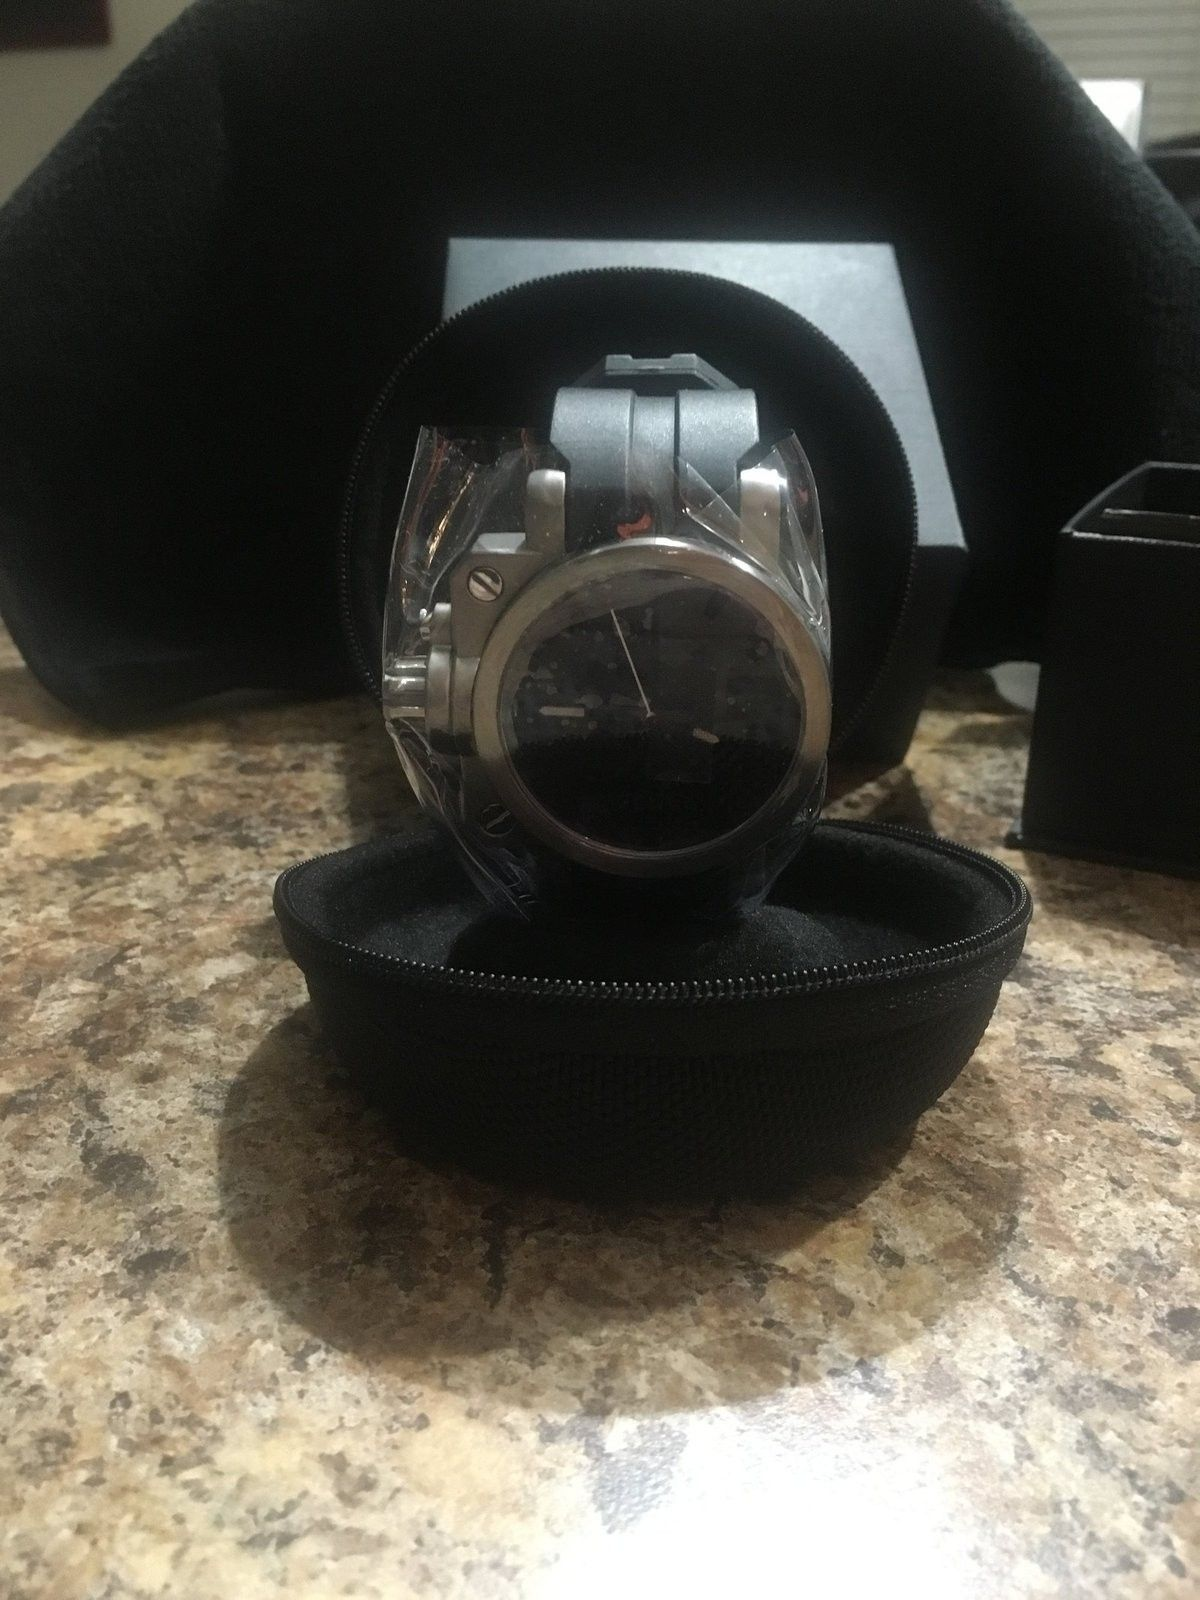 BNIB Ti Brushed / Black Carbon Dial Gearbox - IMG_0185.JPG